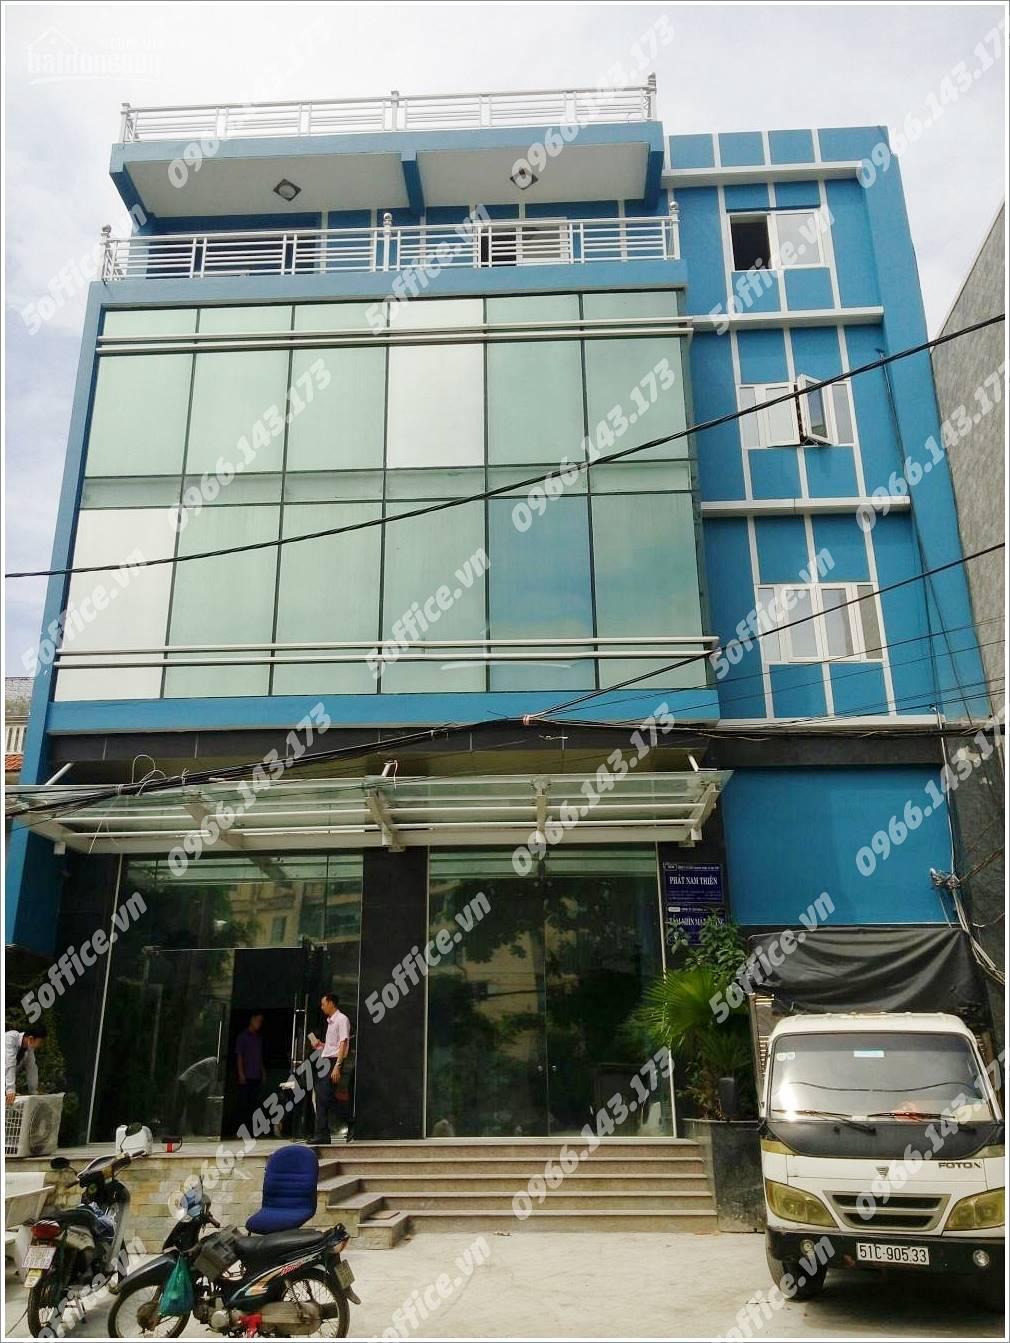 phat-nam-thien-building-duong-so-23-quan-thu-duc-van-phong-cho-thue-tphcm-5real.vn-01